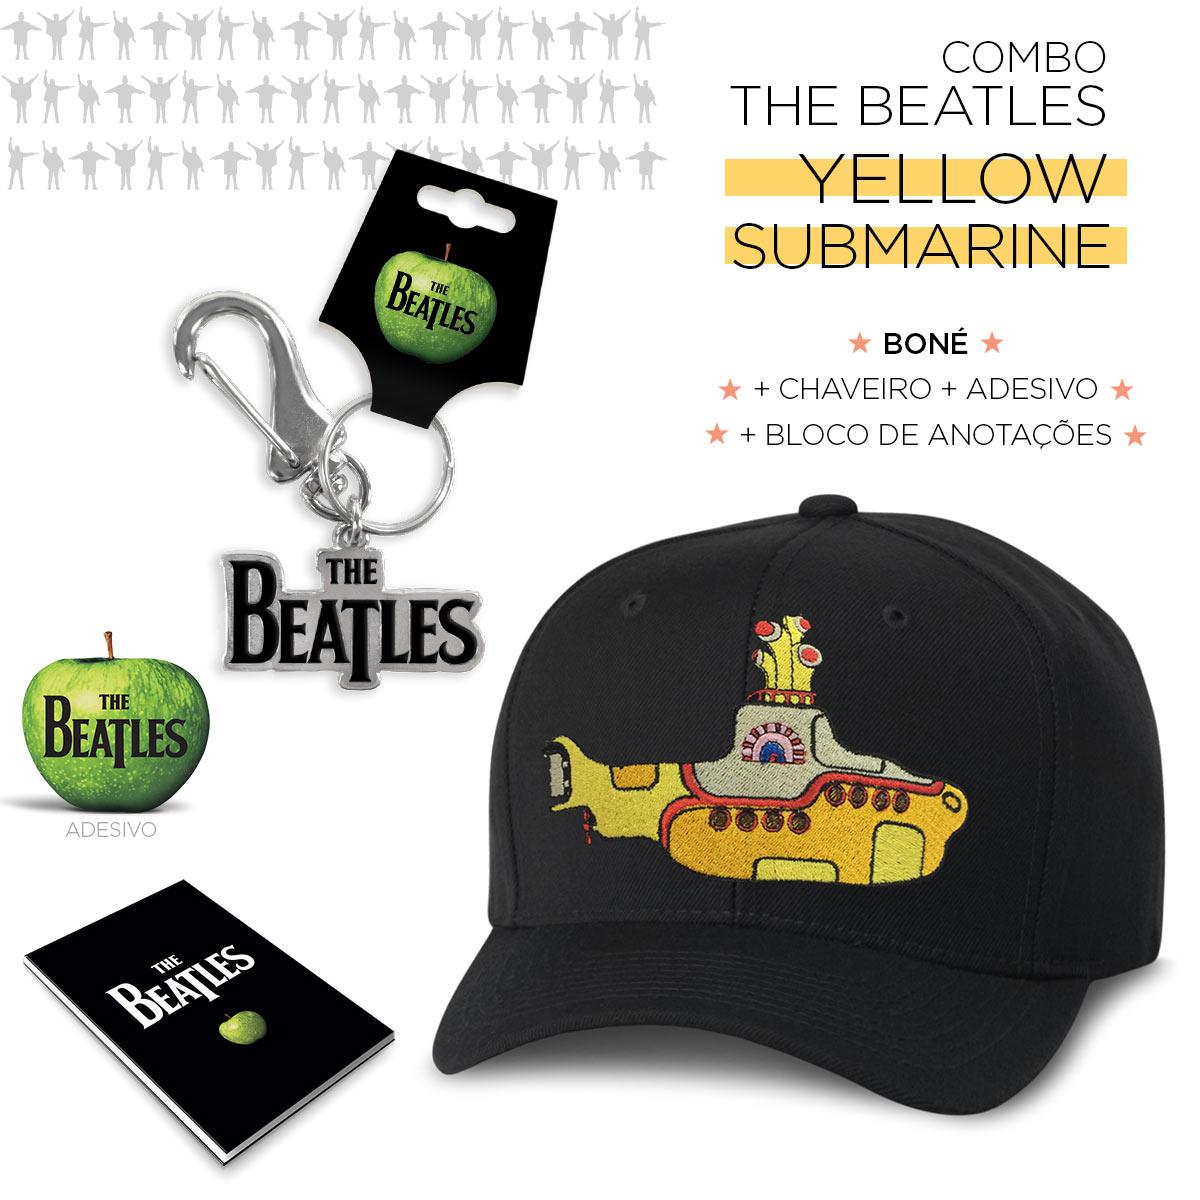 Super Combo The Beatles Yellow Submarine